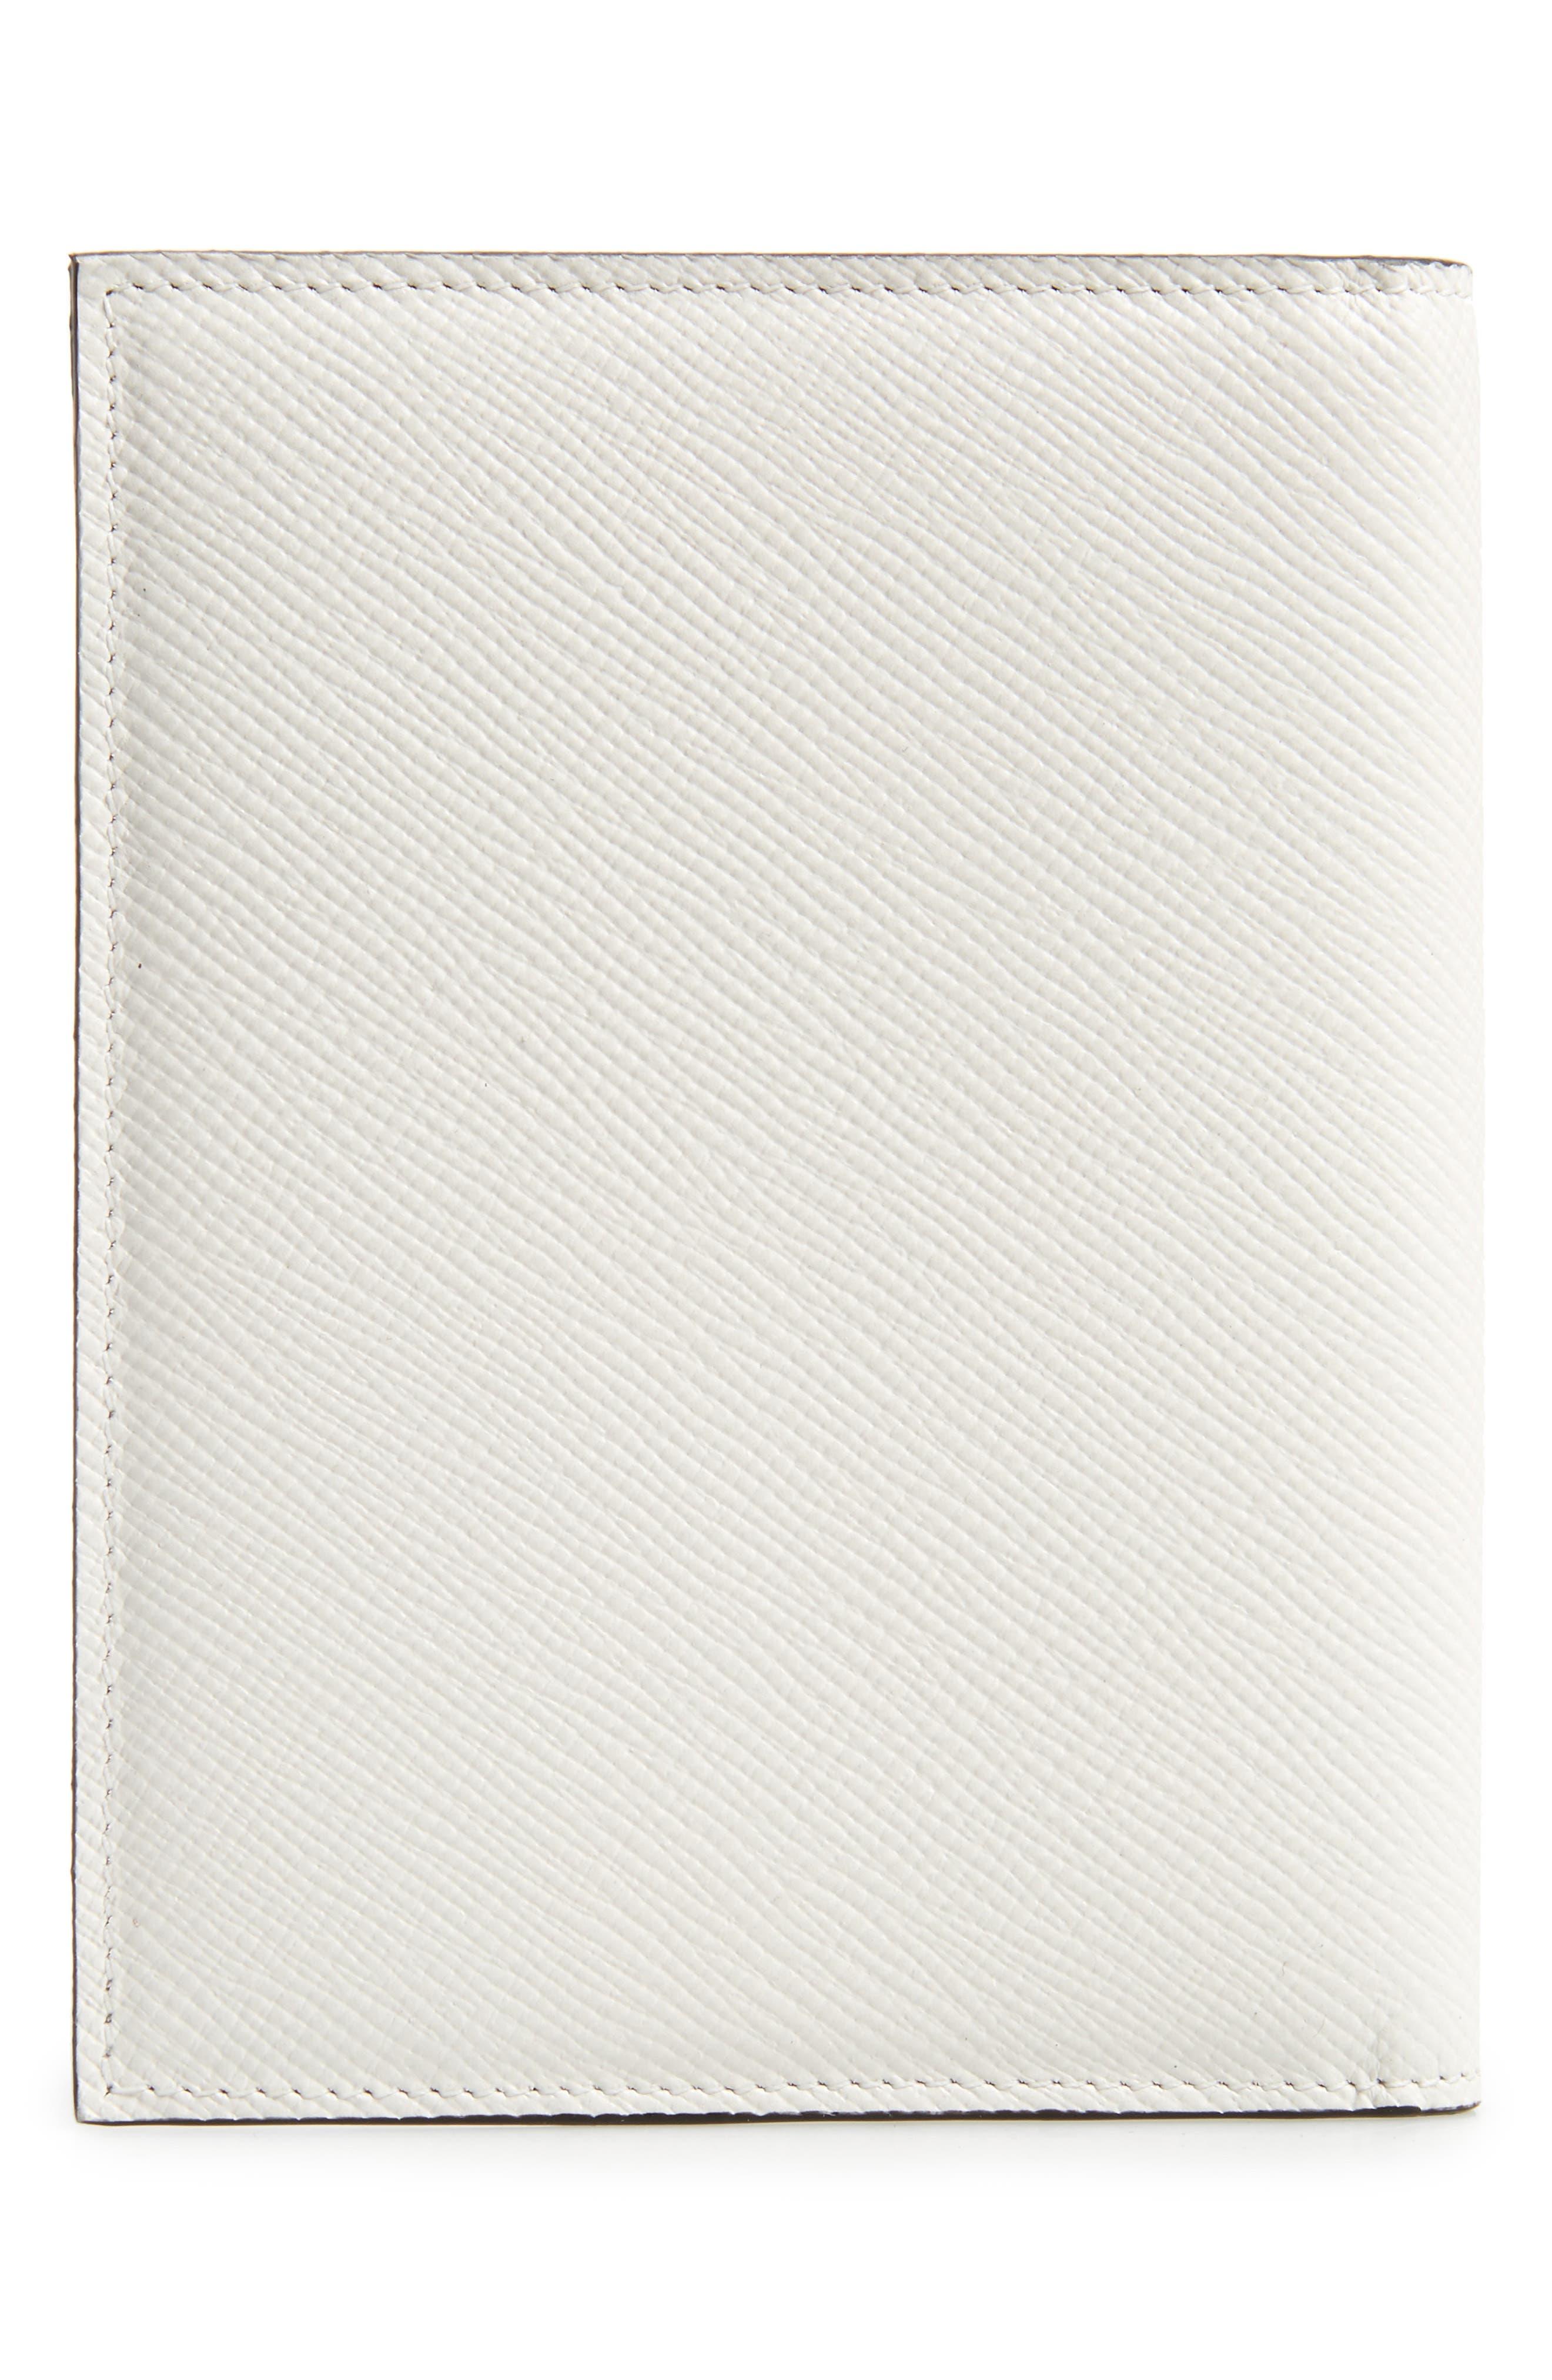 Alternate Image 3  - Serapian Milano Evolution Leather Passport Case